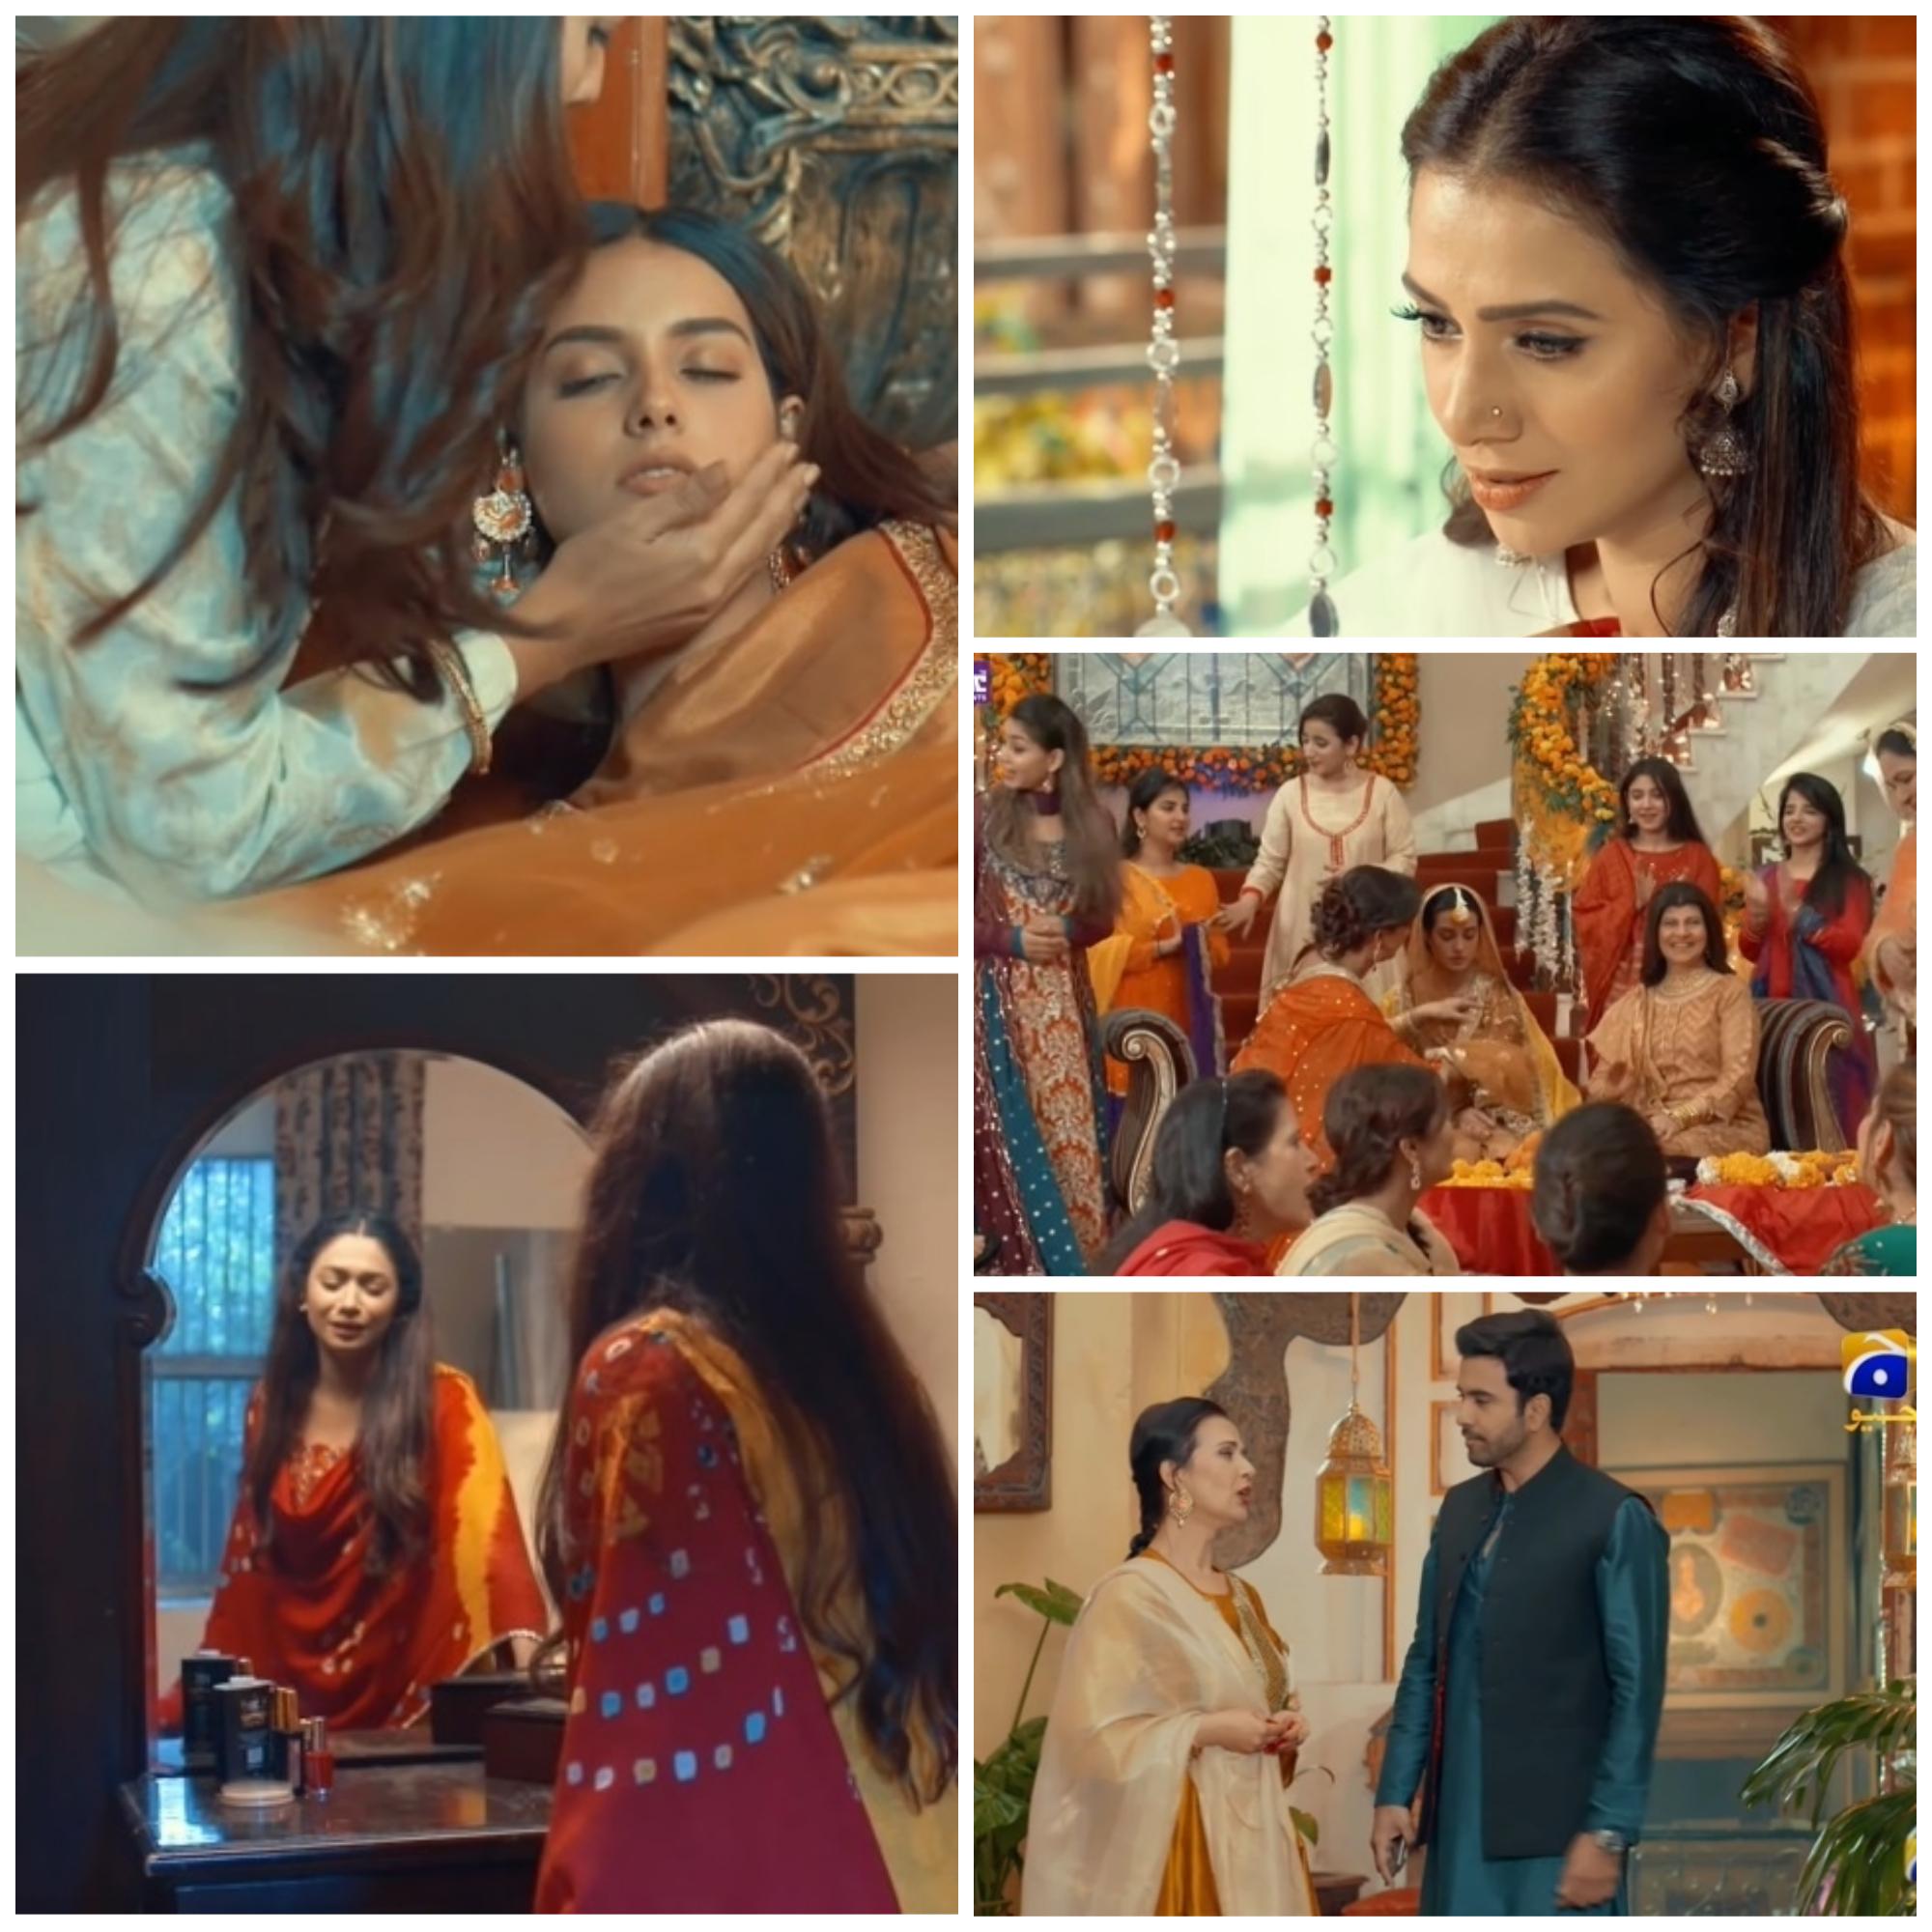 Khuda Aur Mohabbat 3 Episode 13 Story Review - The Bad News